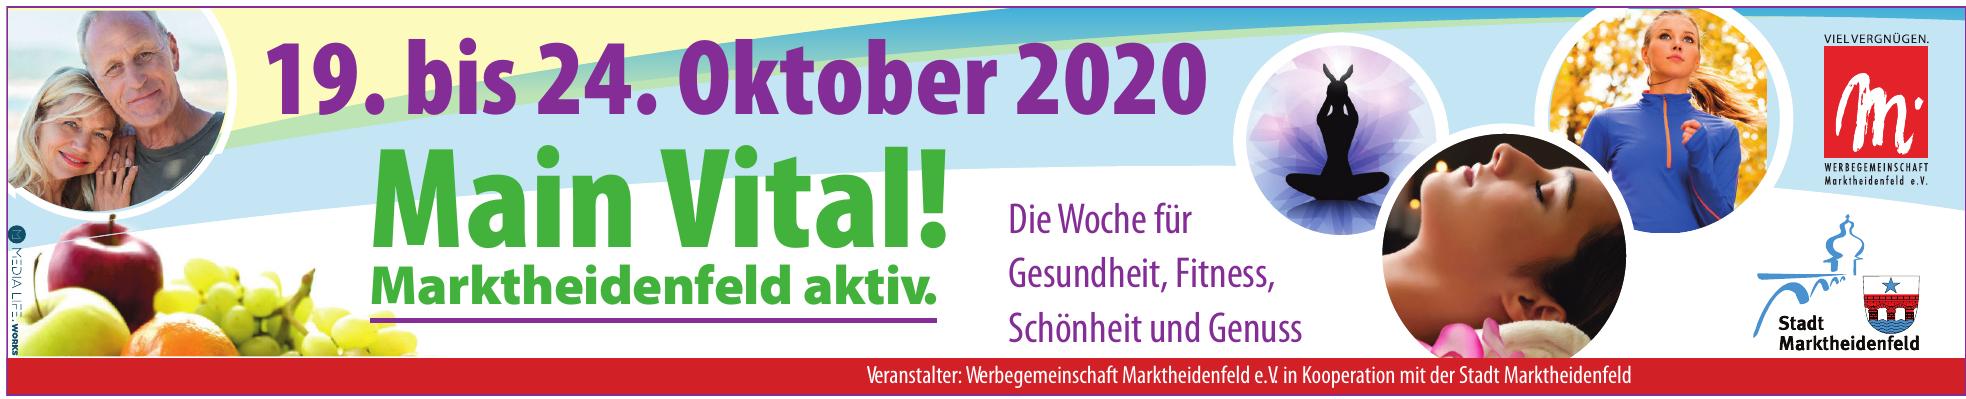 Main Vital! Marktheidenfeld aktiv. Image 1